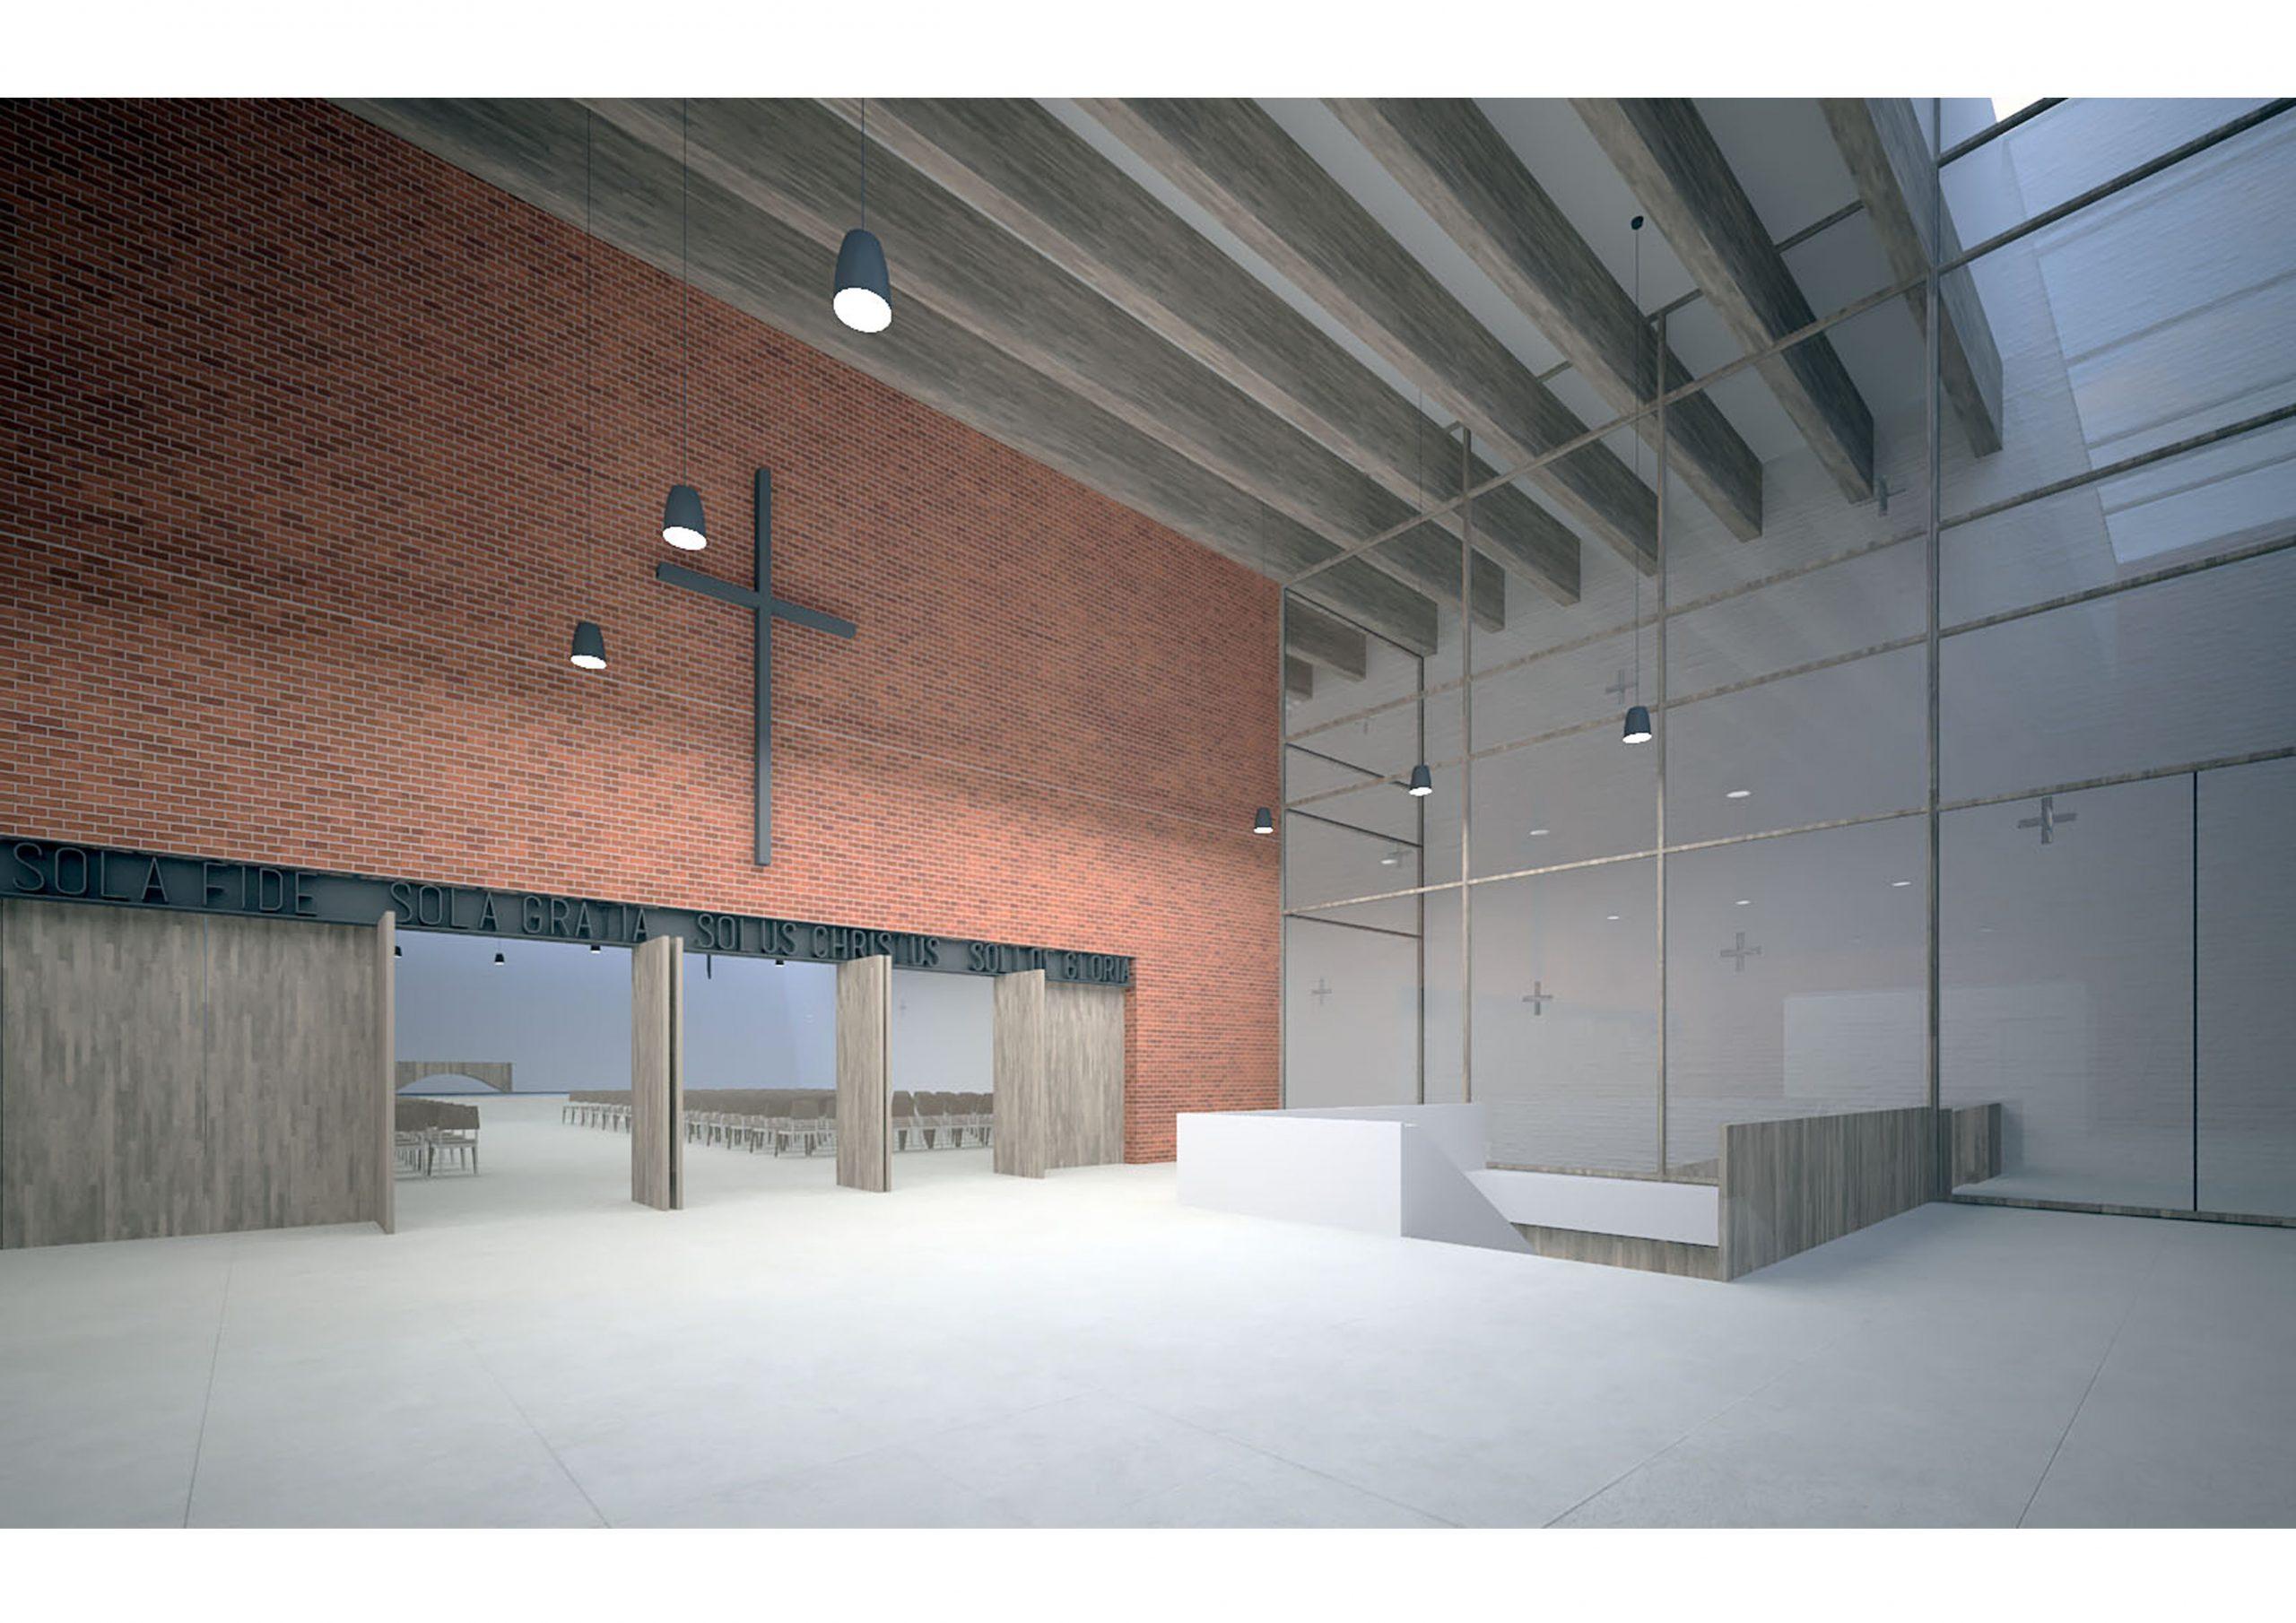 https://nbc-arhitect.ro/wp-content/uploads/2020/10/NBC-Arhitect-_-public-buildings-_-Protestant-Church-_-Copenhagen-_-exterior-view_7-scaled.jpg